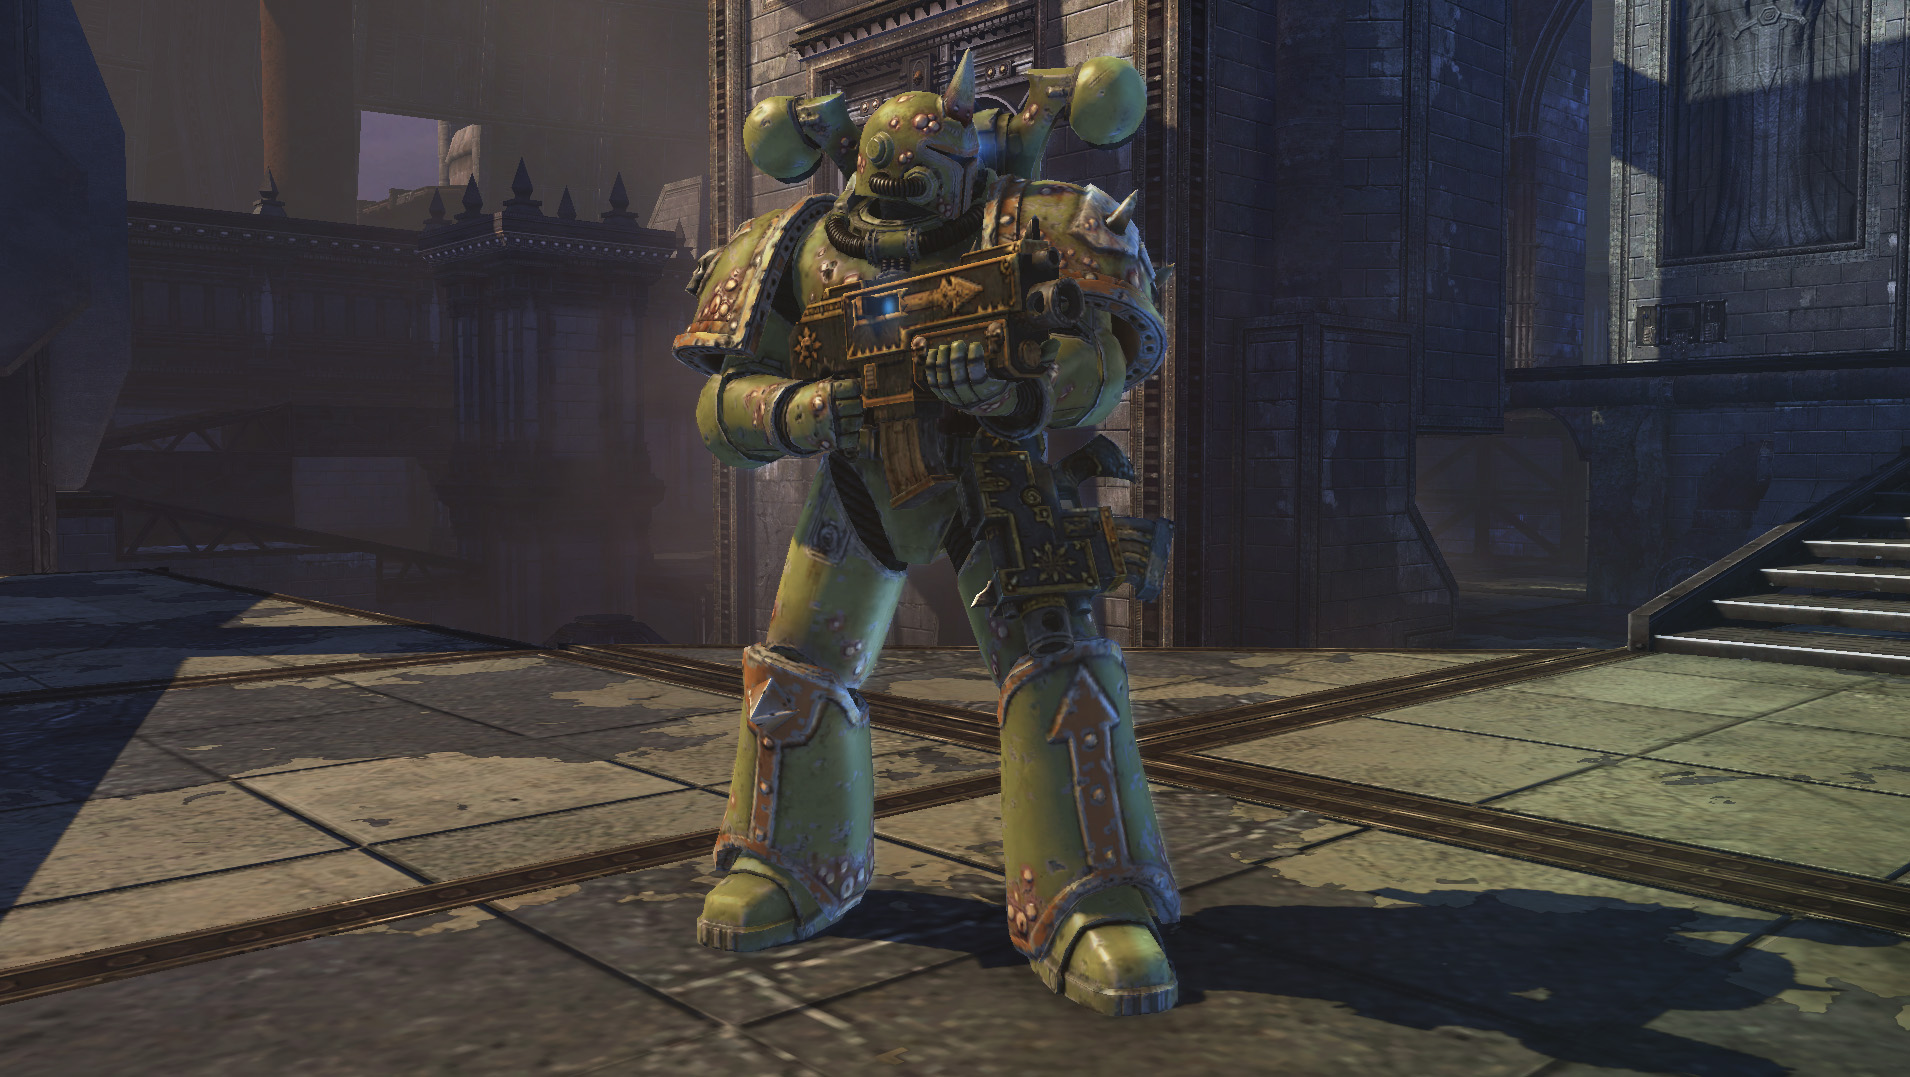 Warhammer 40,000: Space Marine - Death Guard Champion Chapter Pack DLC screenshot